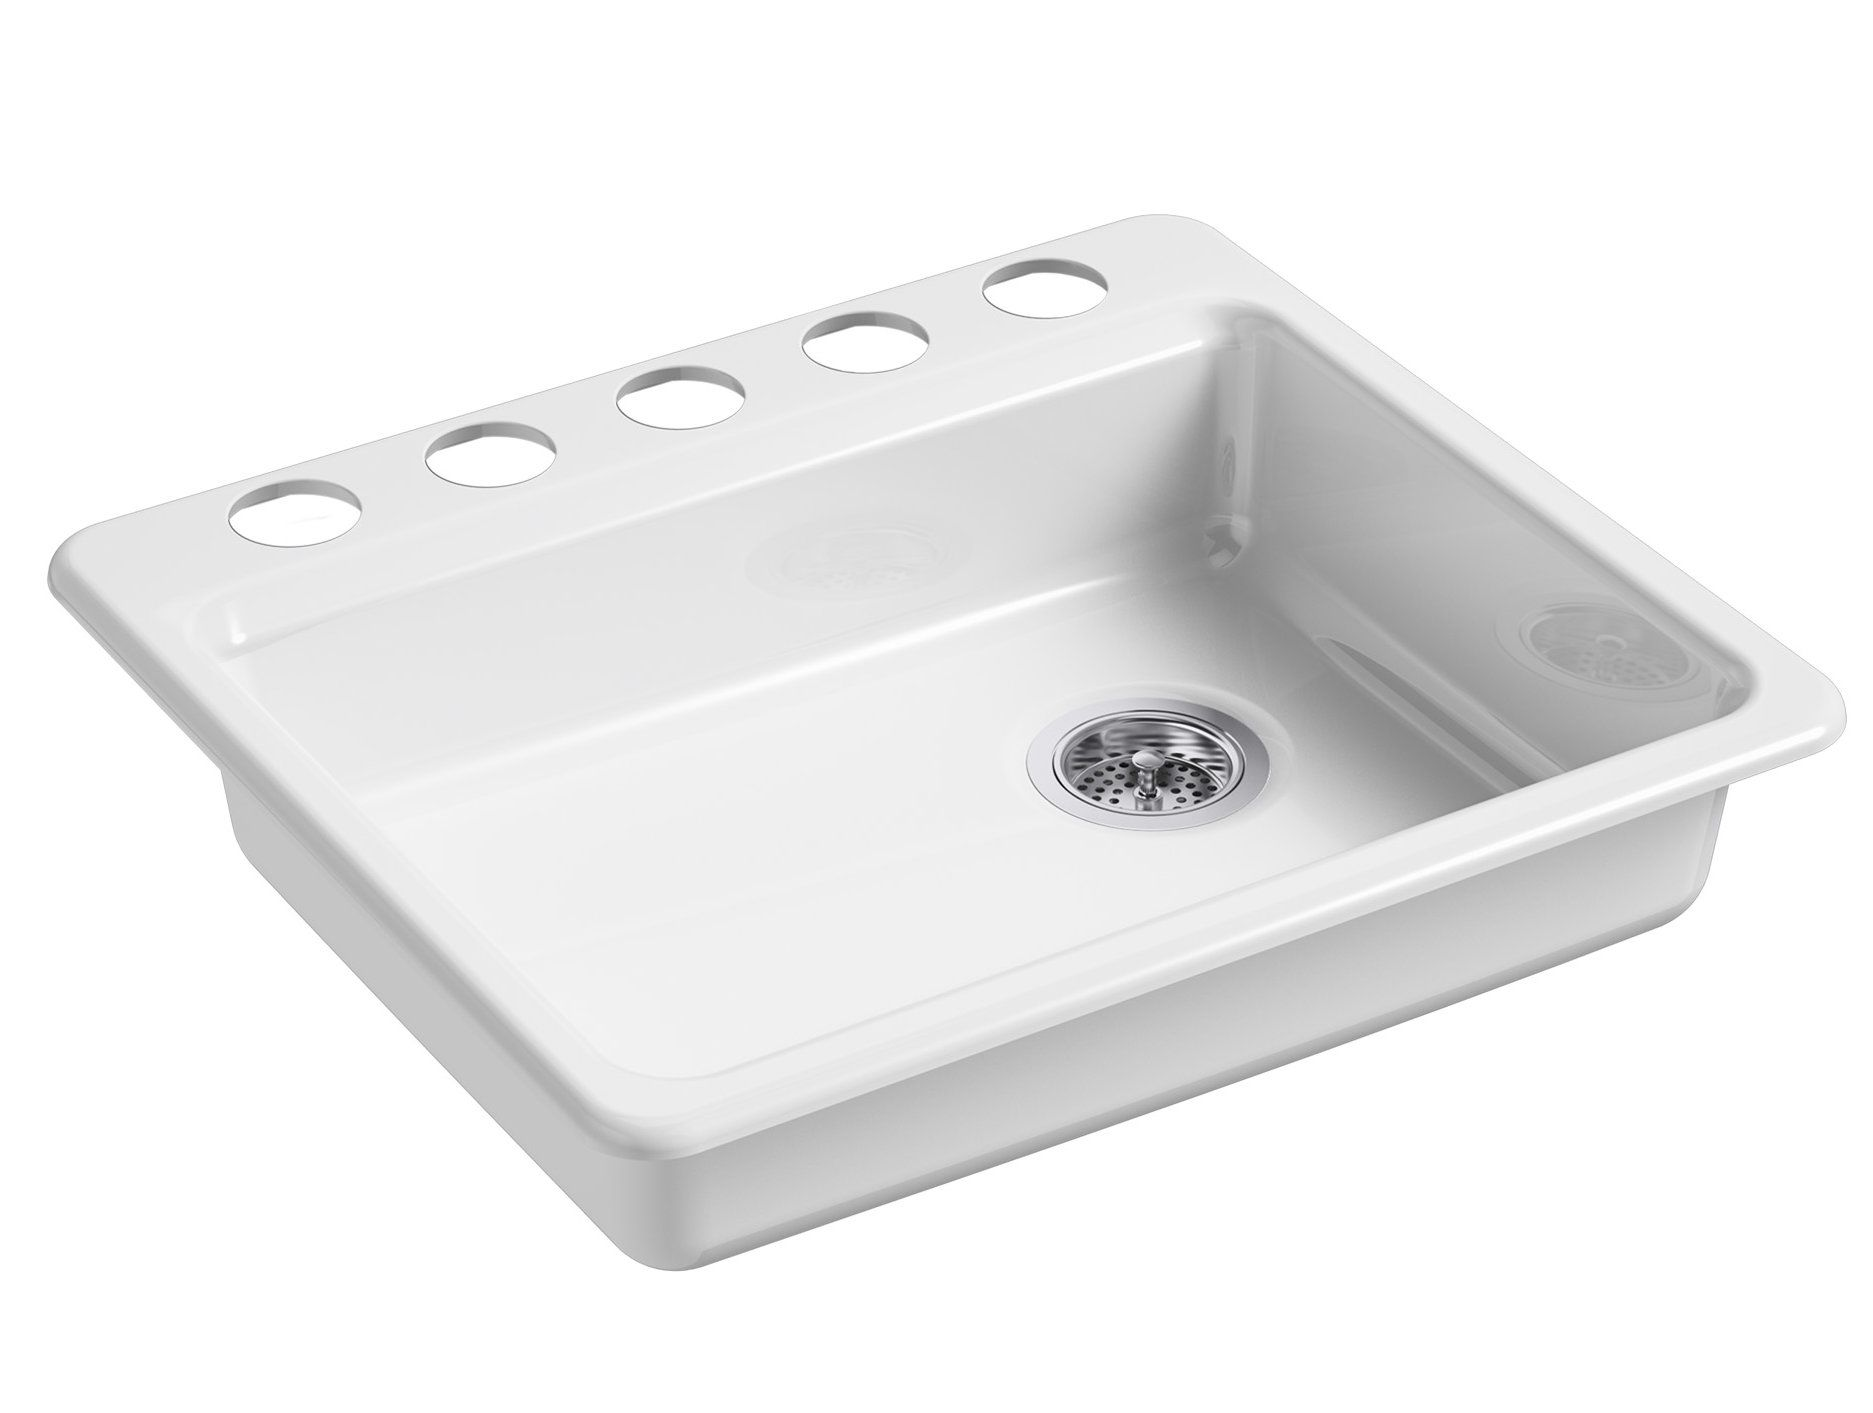 "Riverby 25"" x 22"" Undermount Single Bowl Kitchen Sink"